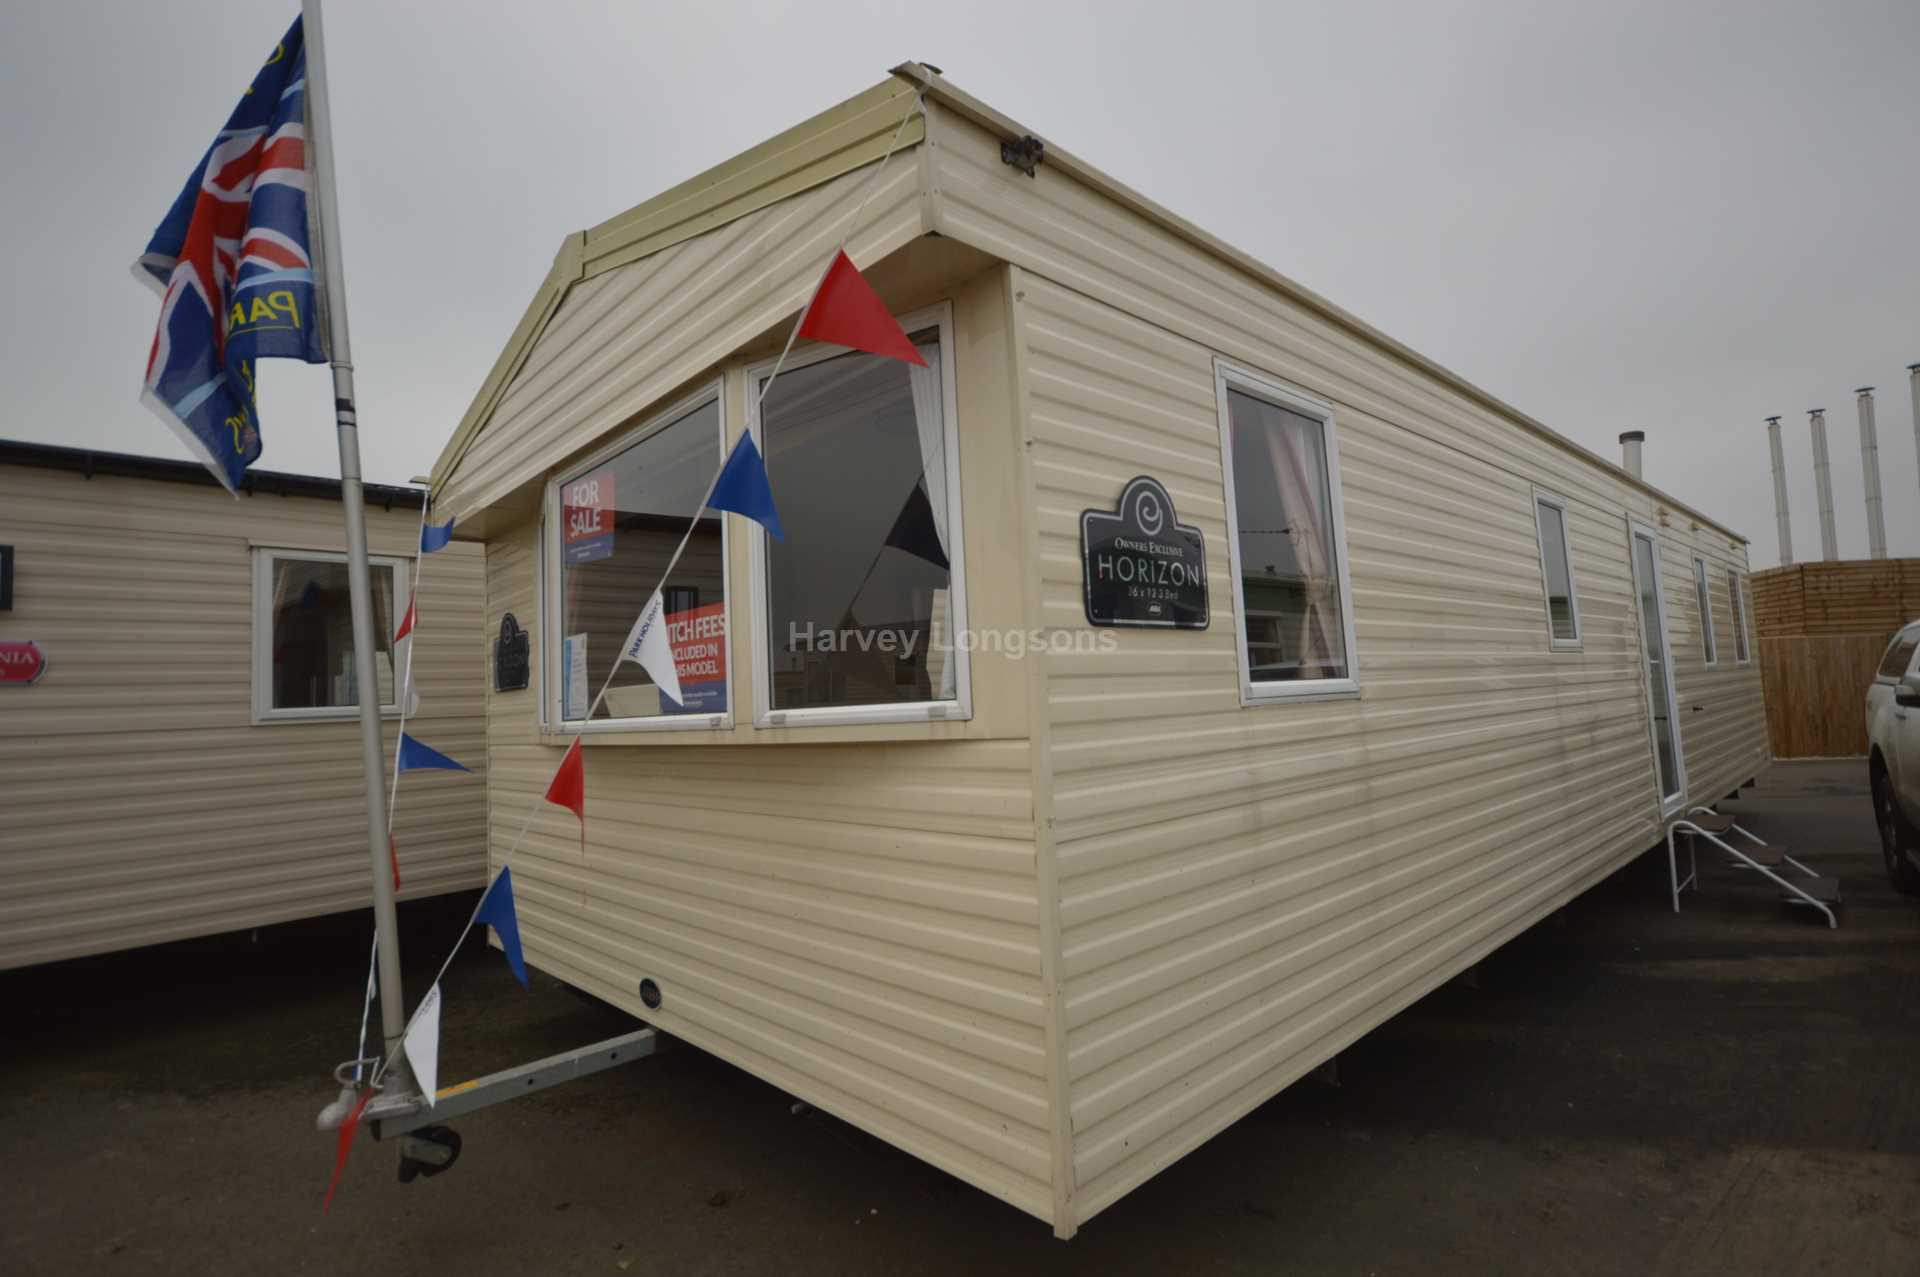 Model Bedroom Caravan For Sale Harts Holiday Park Leysdown Road Leysdown